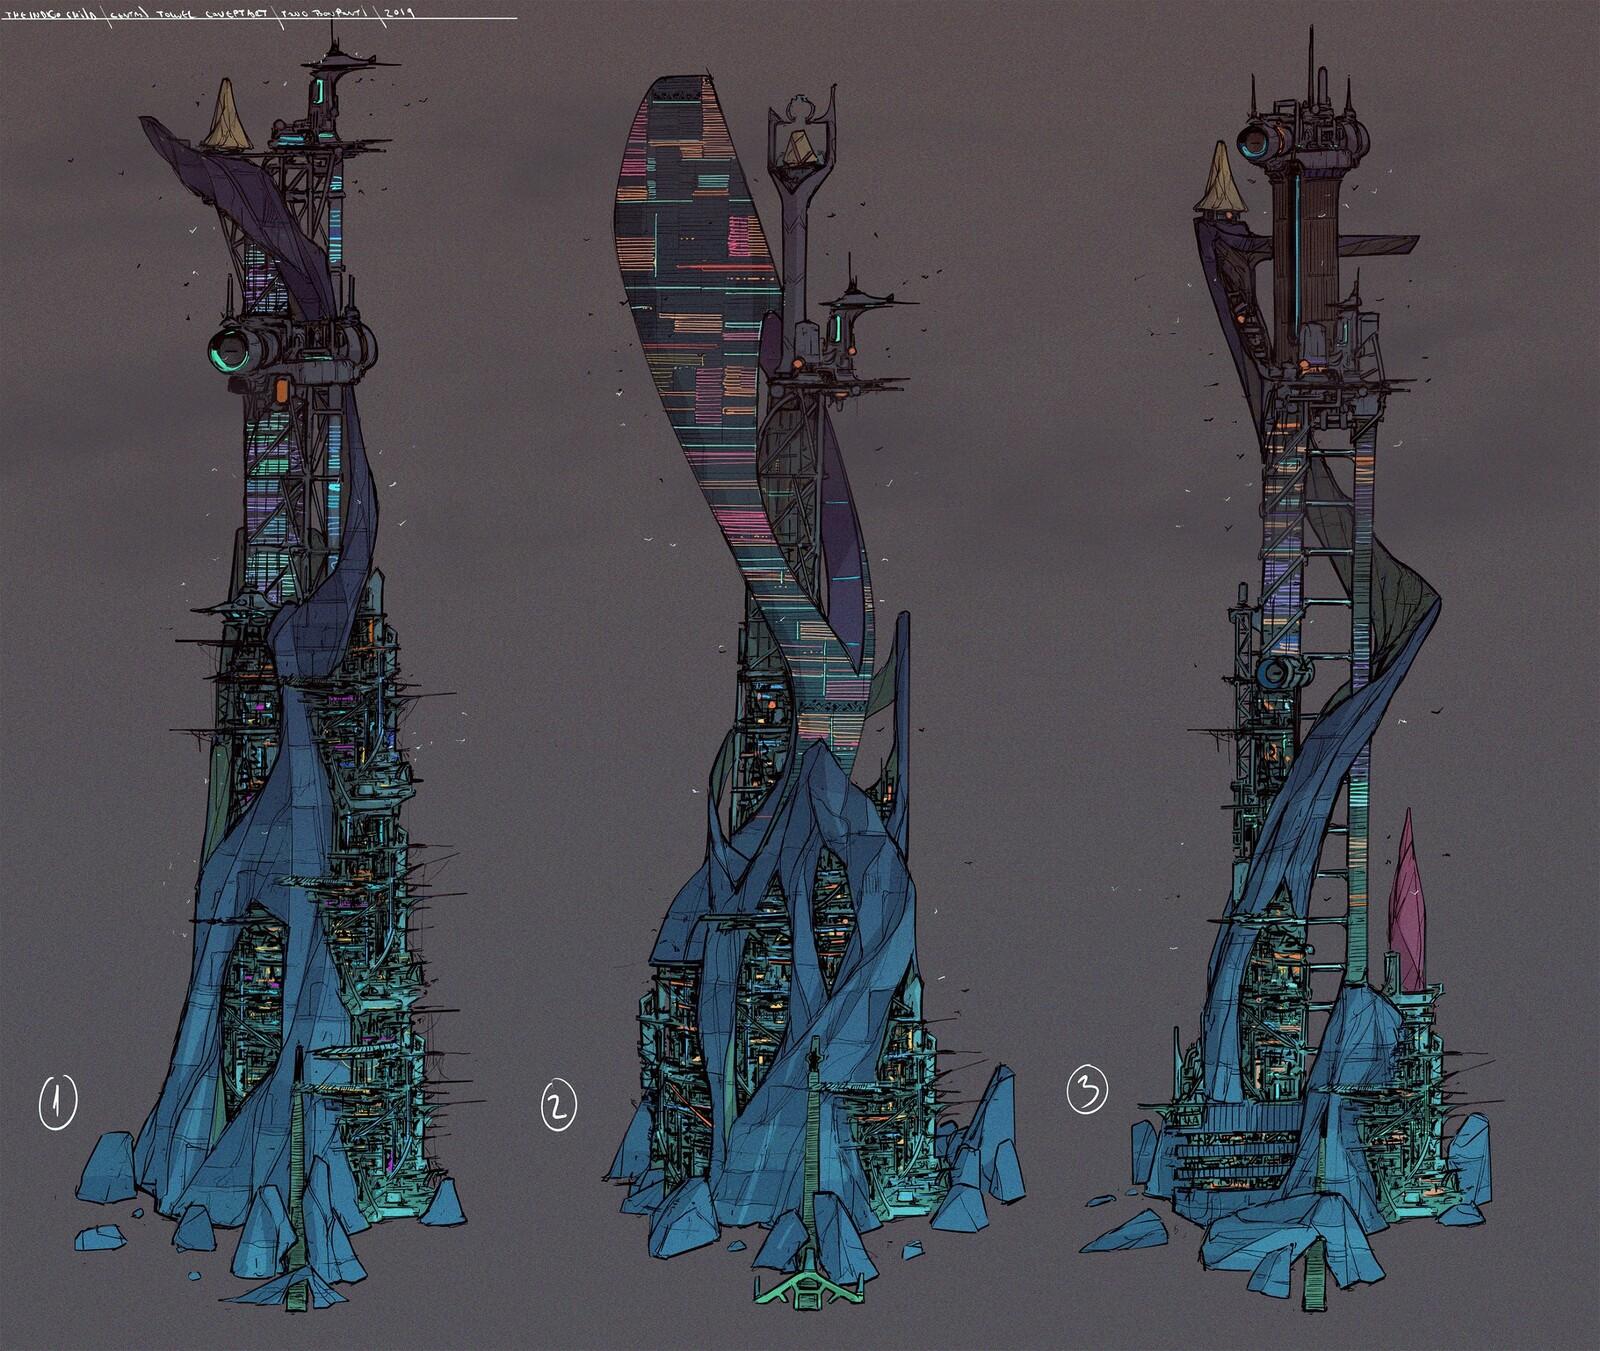 Indigo child - tower concept art